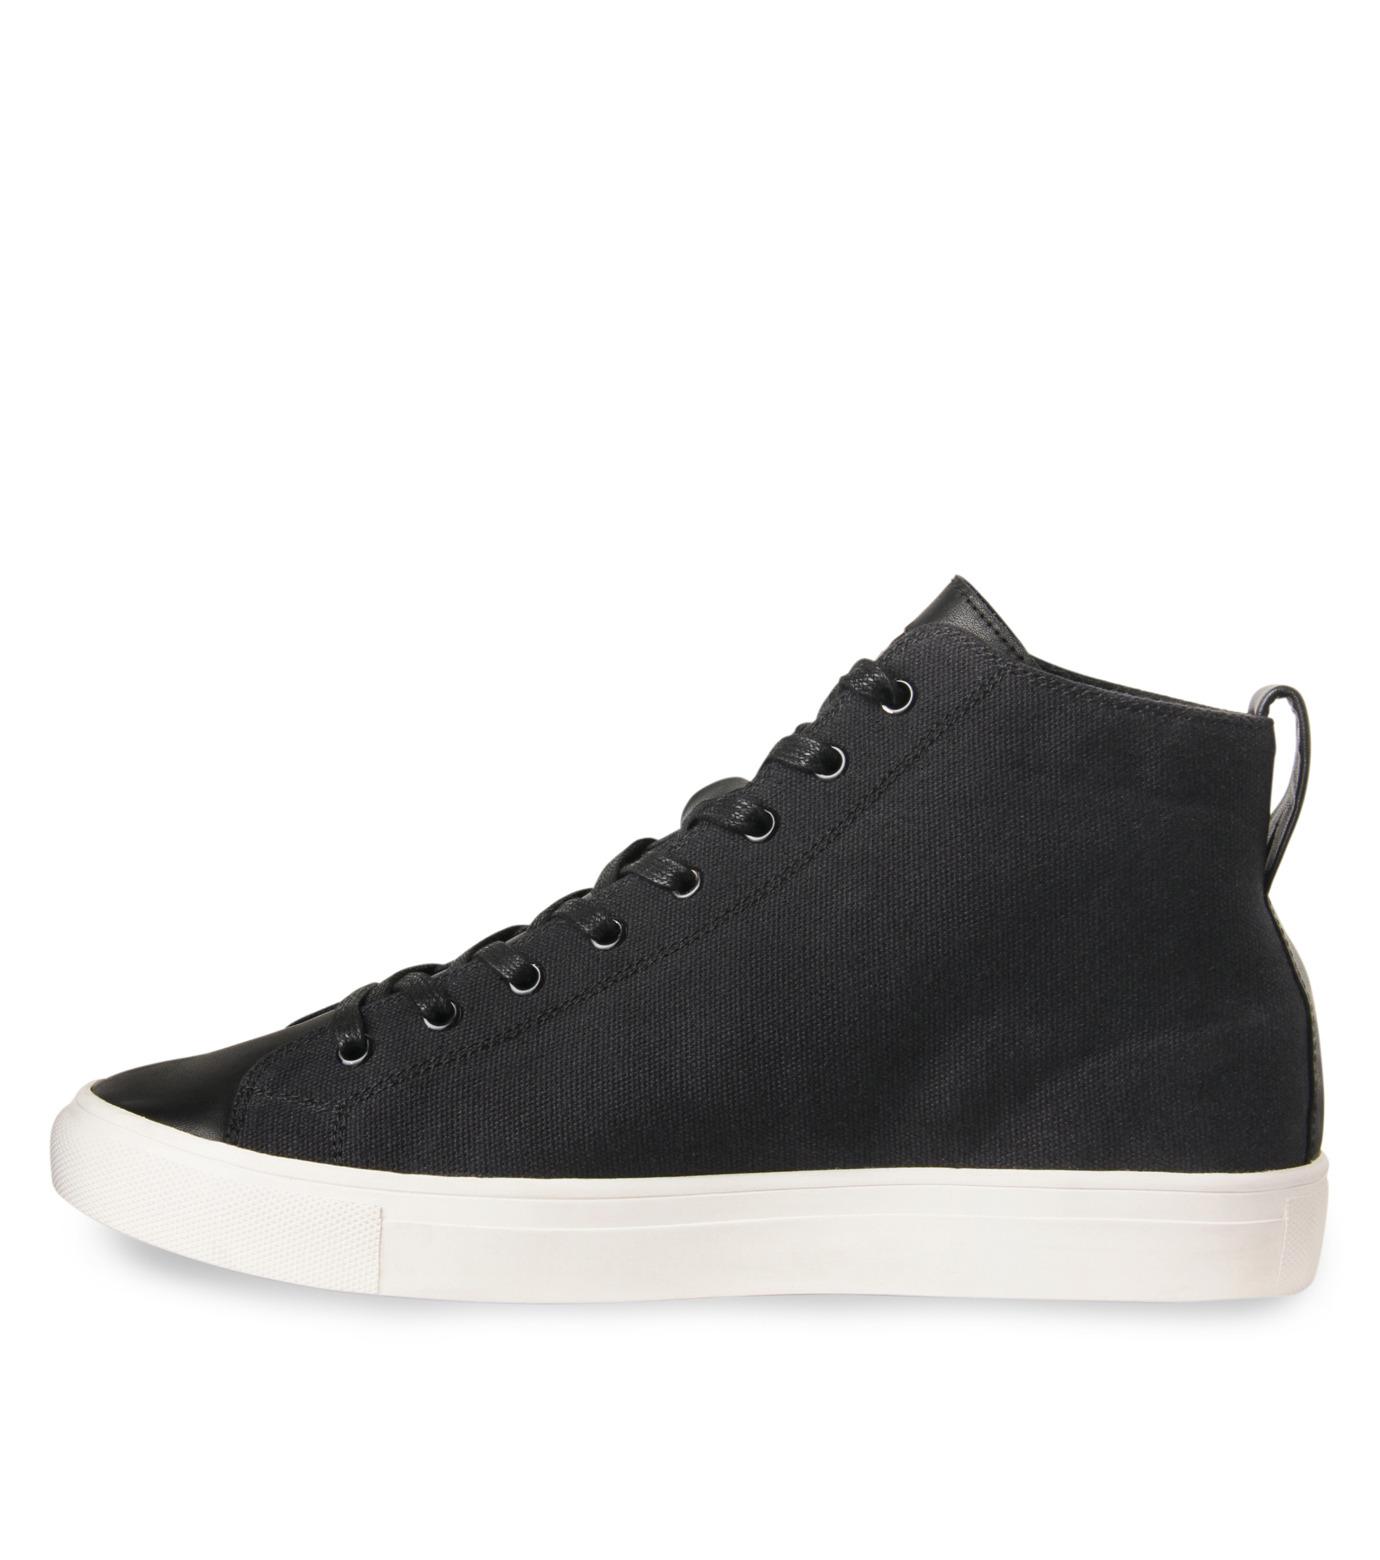 HL HEDDIE LOVU(エイチエル・エディールーヴ)のHL Hi sneaker-BLACK(スニーカー/sneaker)-16A90006-13 拡大詳細画像2